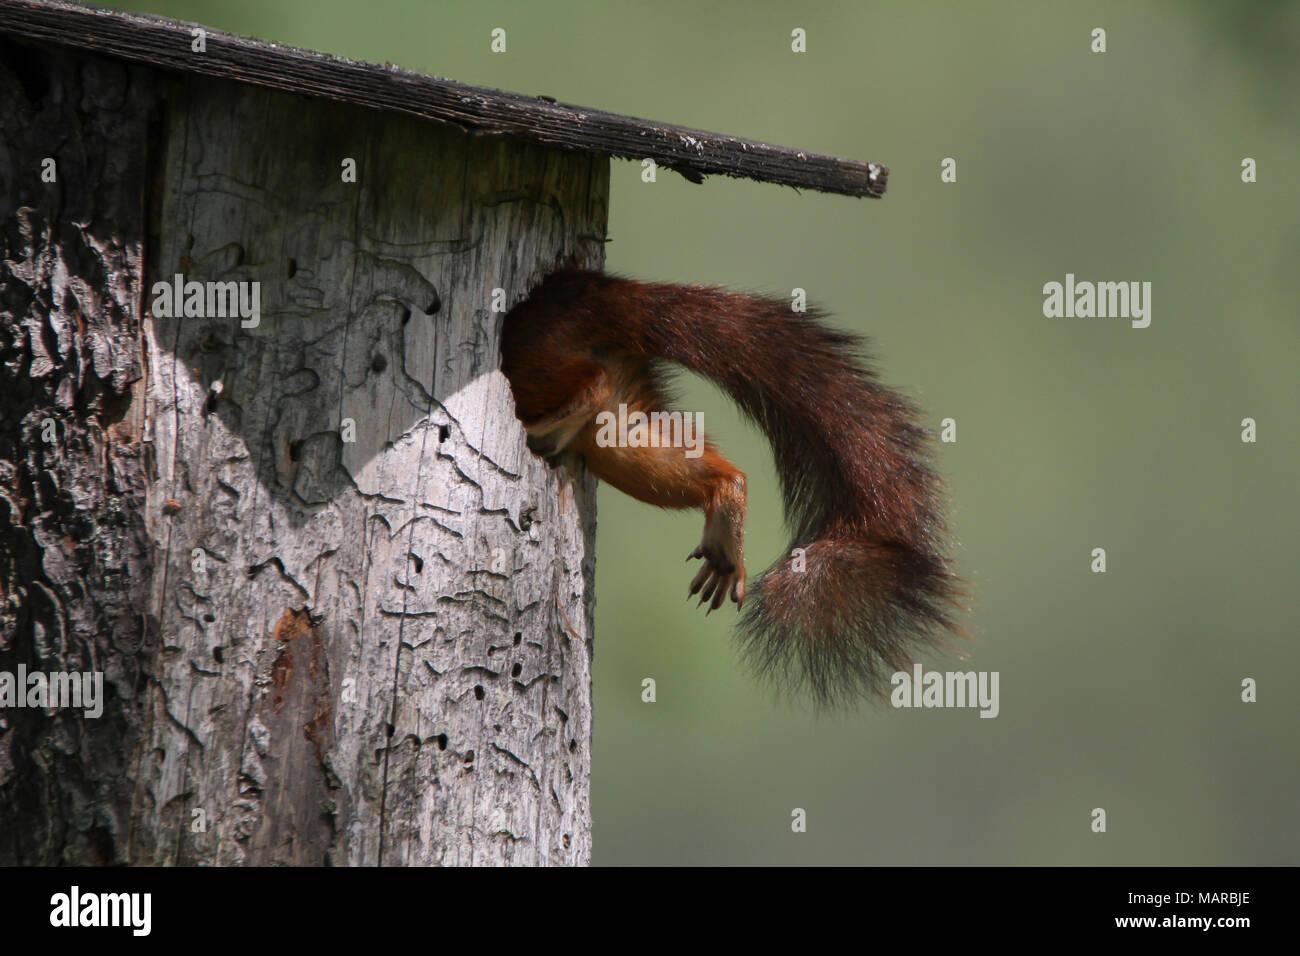 Red Squirrel (Sciurus vulgaris). Mother climbing into nesting box. Dalarna, Schweden - Stock Image